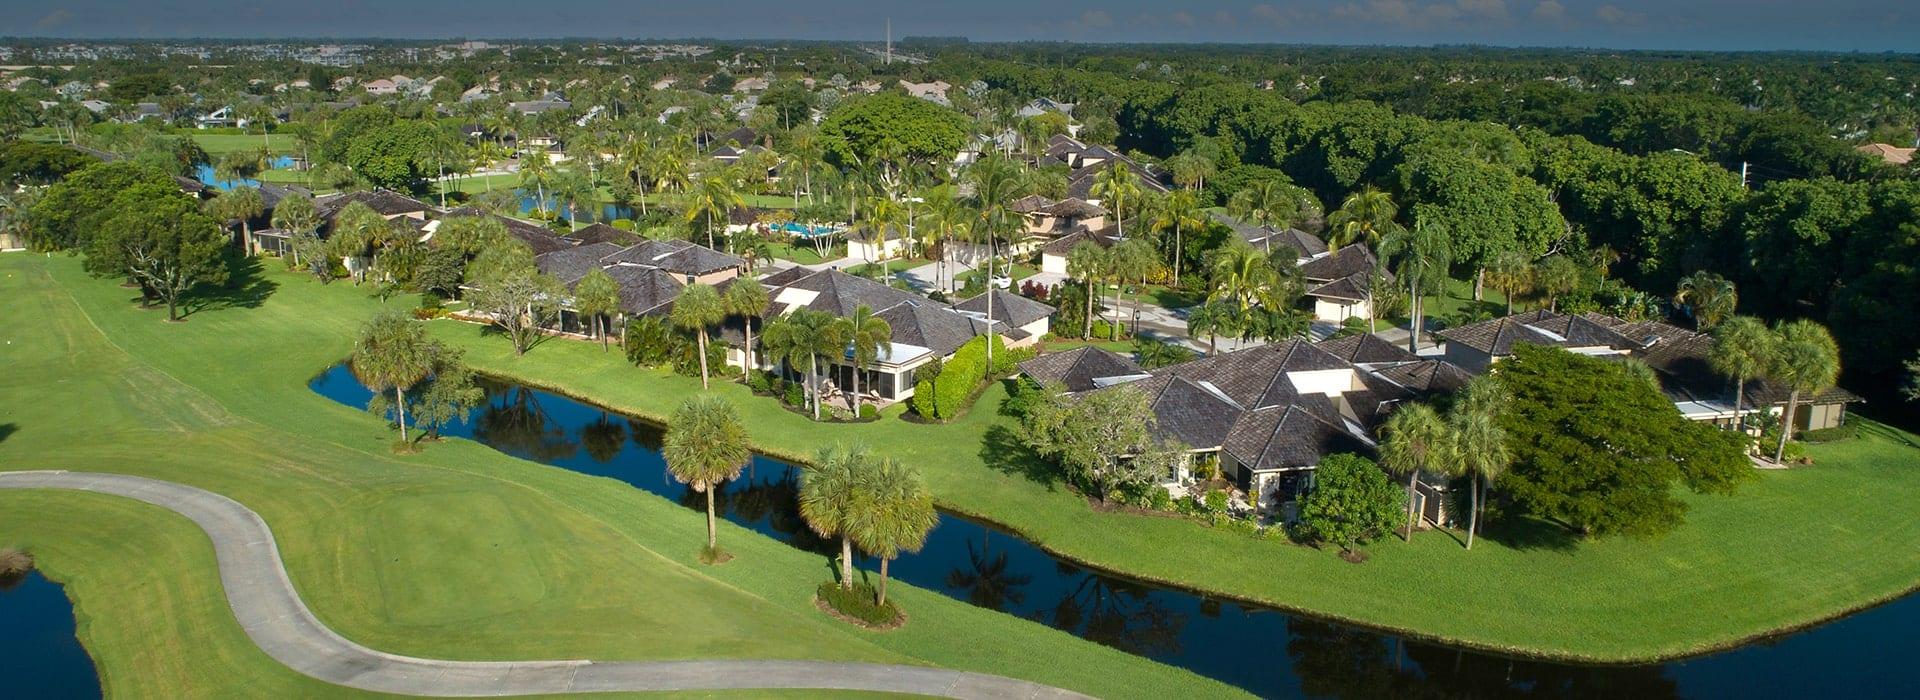 Boca West Waters Reach neighborhood alongside large lake and golf course